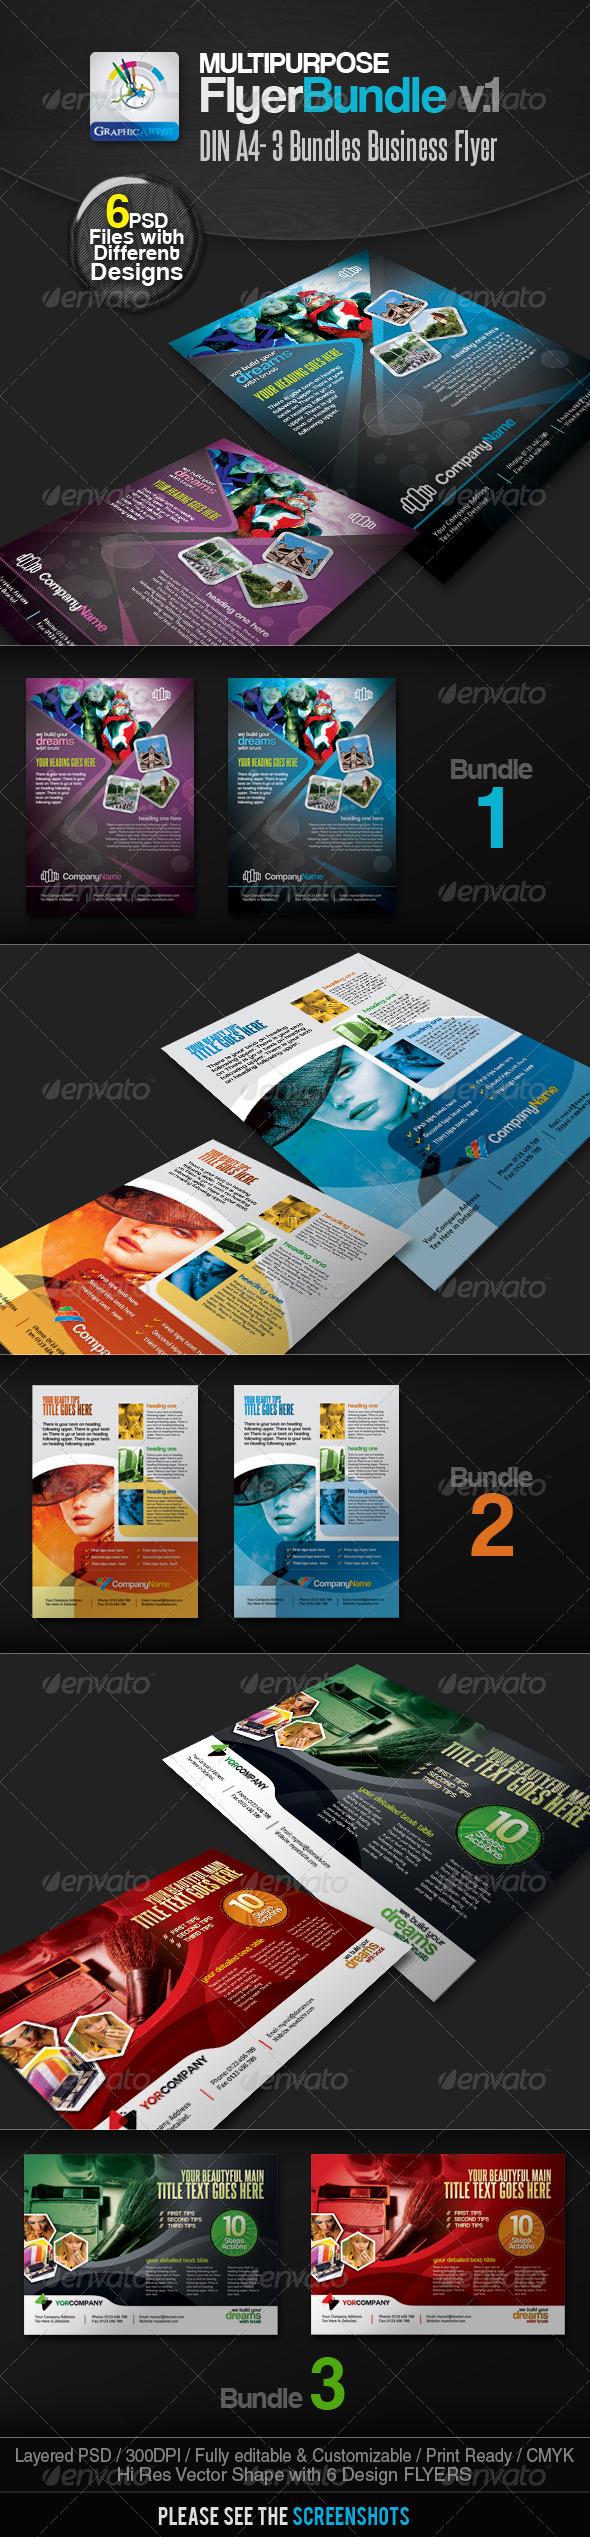 Multipurpose Business Flyer Pack v.1 - Corporate Flyers